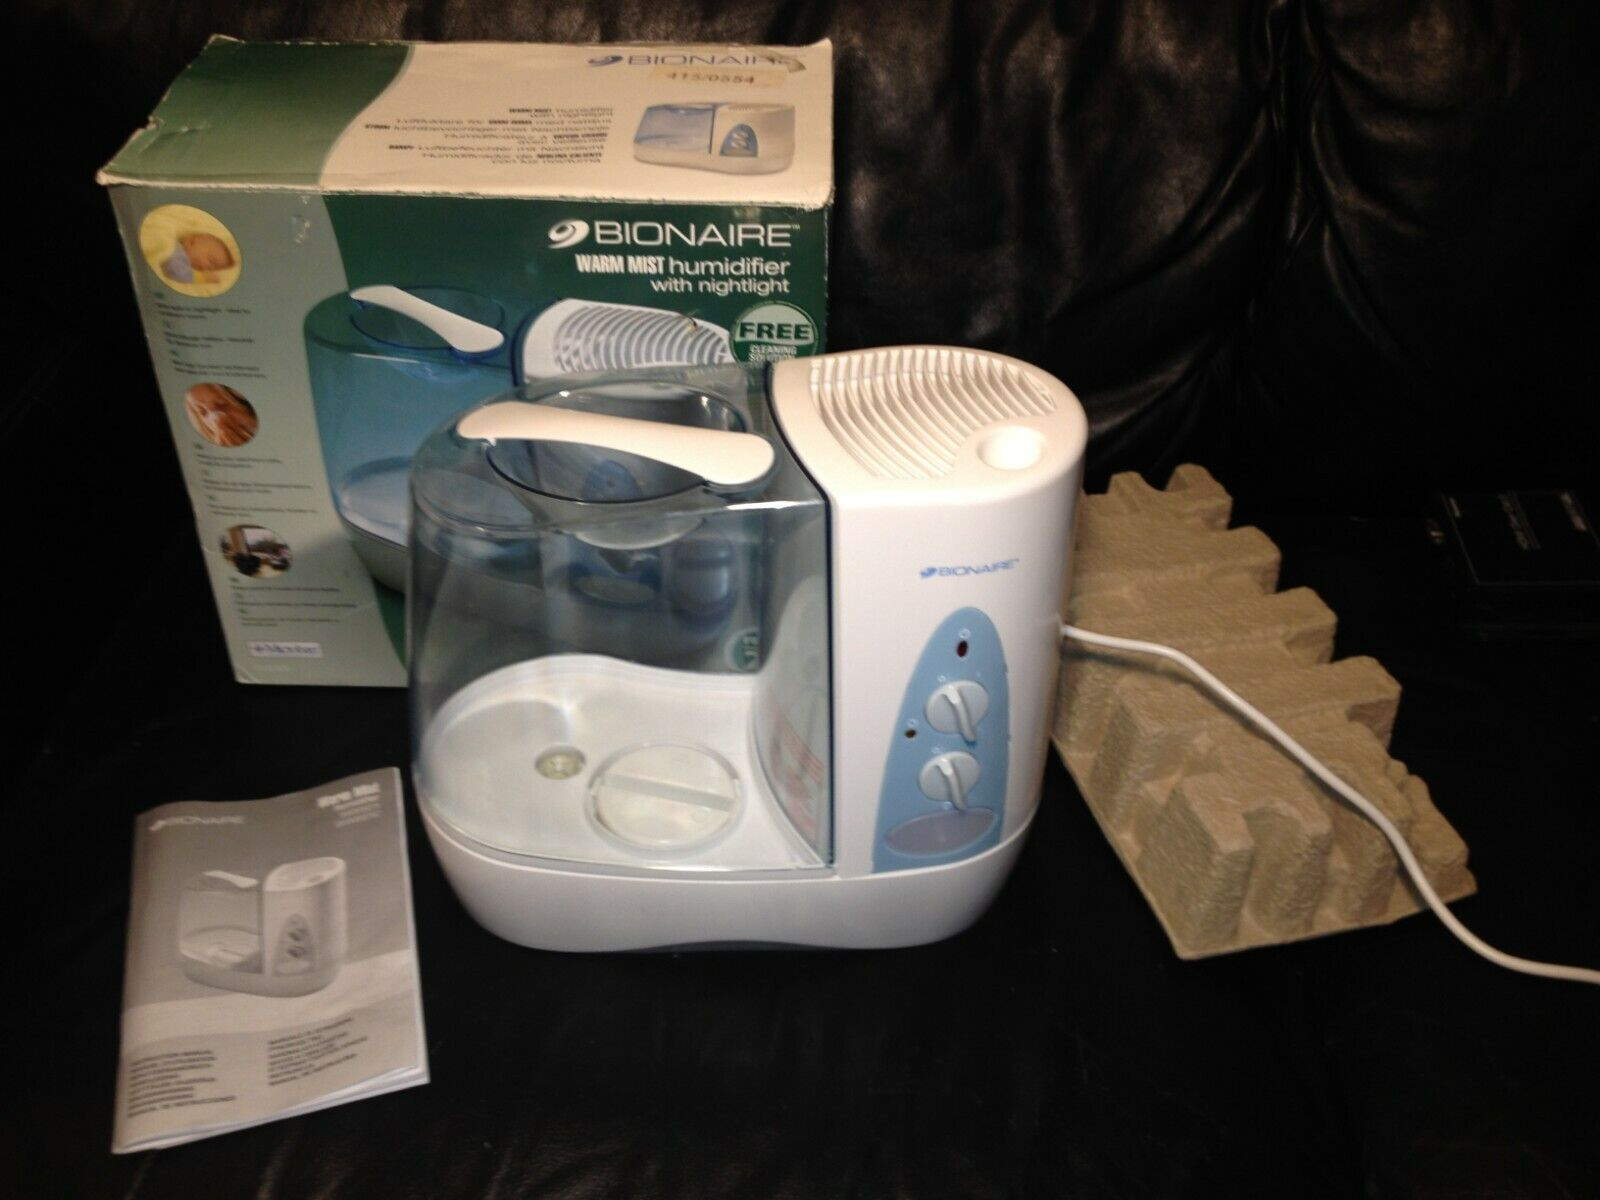 A Bionaire Warm Mist Air Humidifier Vaporiser Nightlight Good For Colds